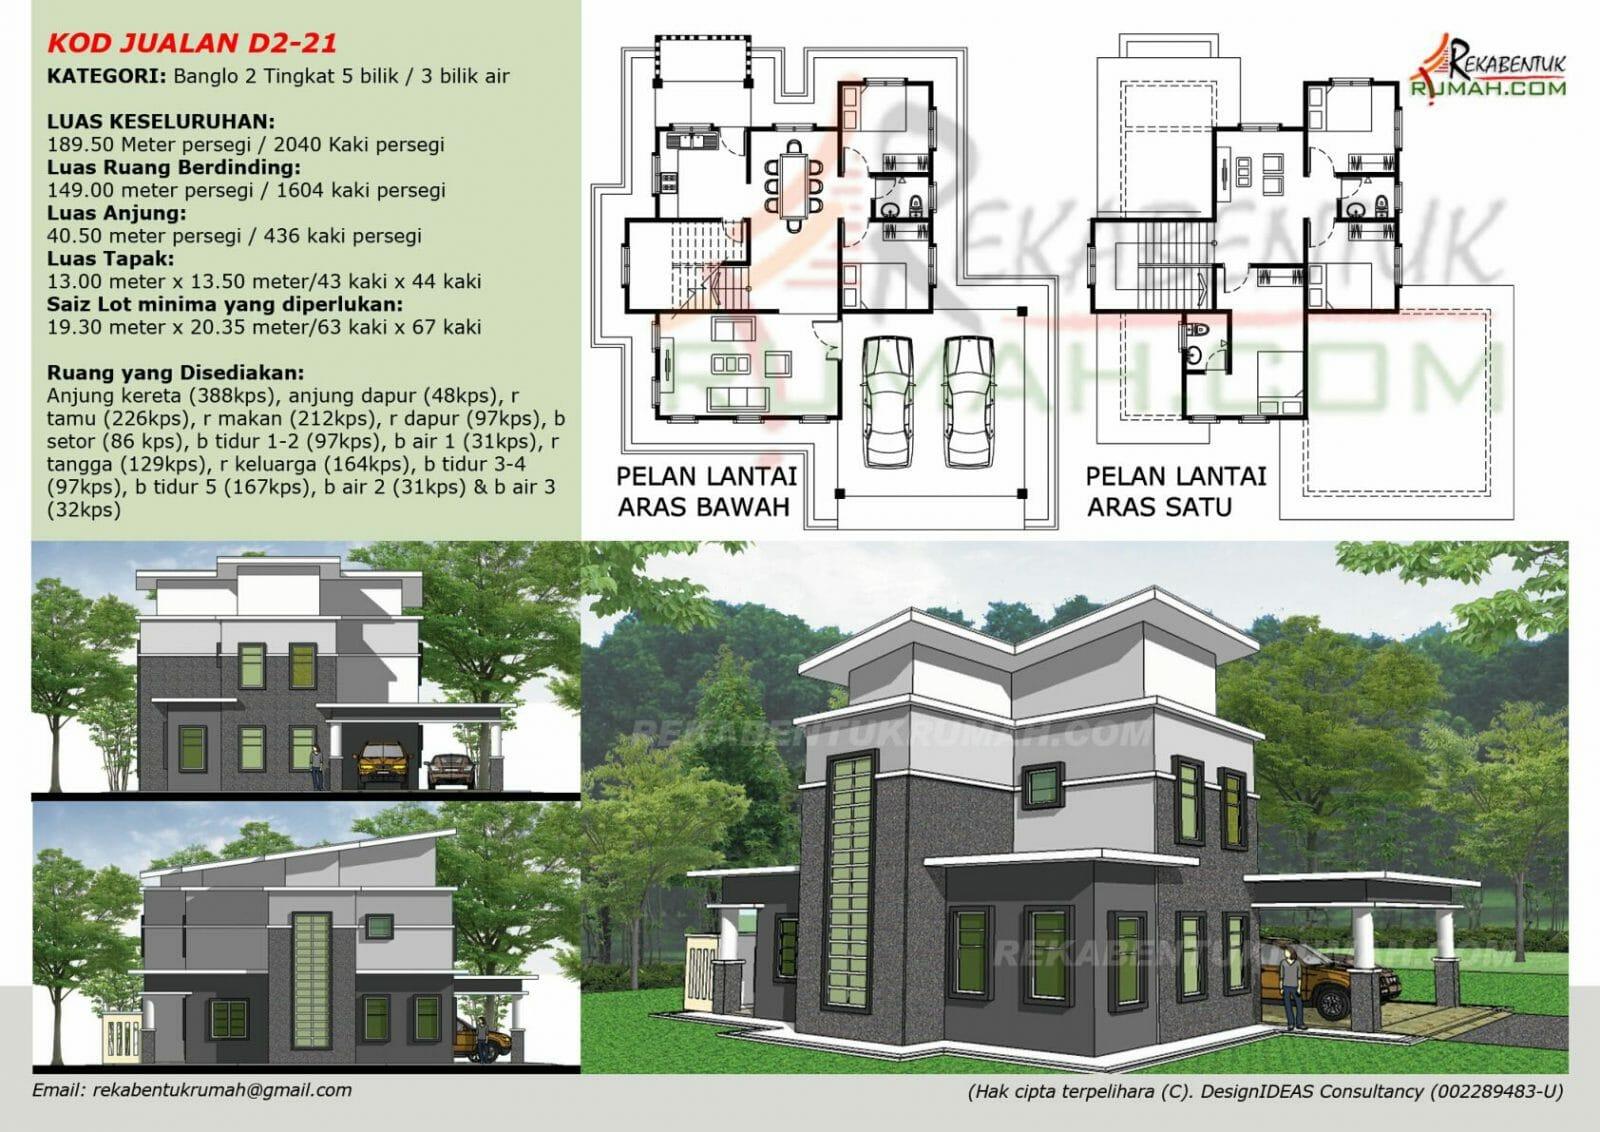 Home Grid 2